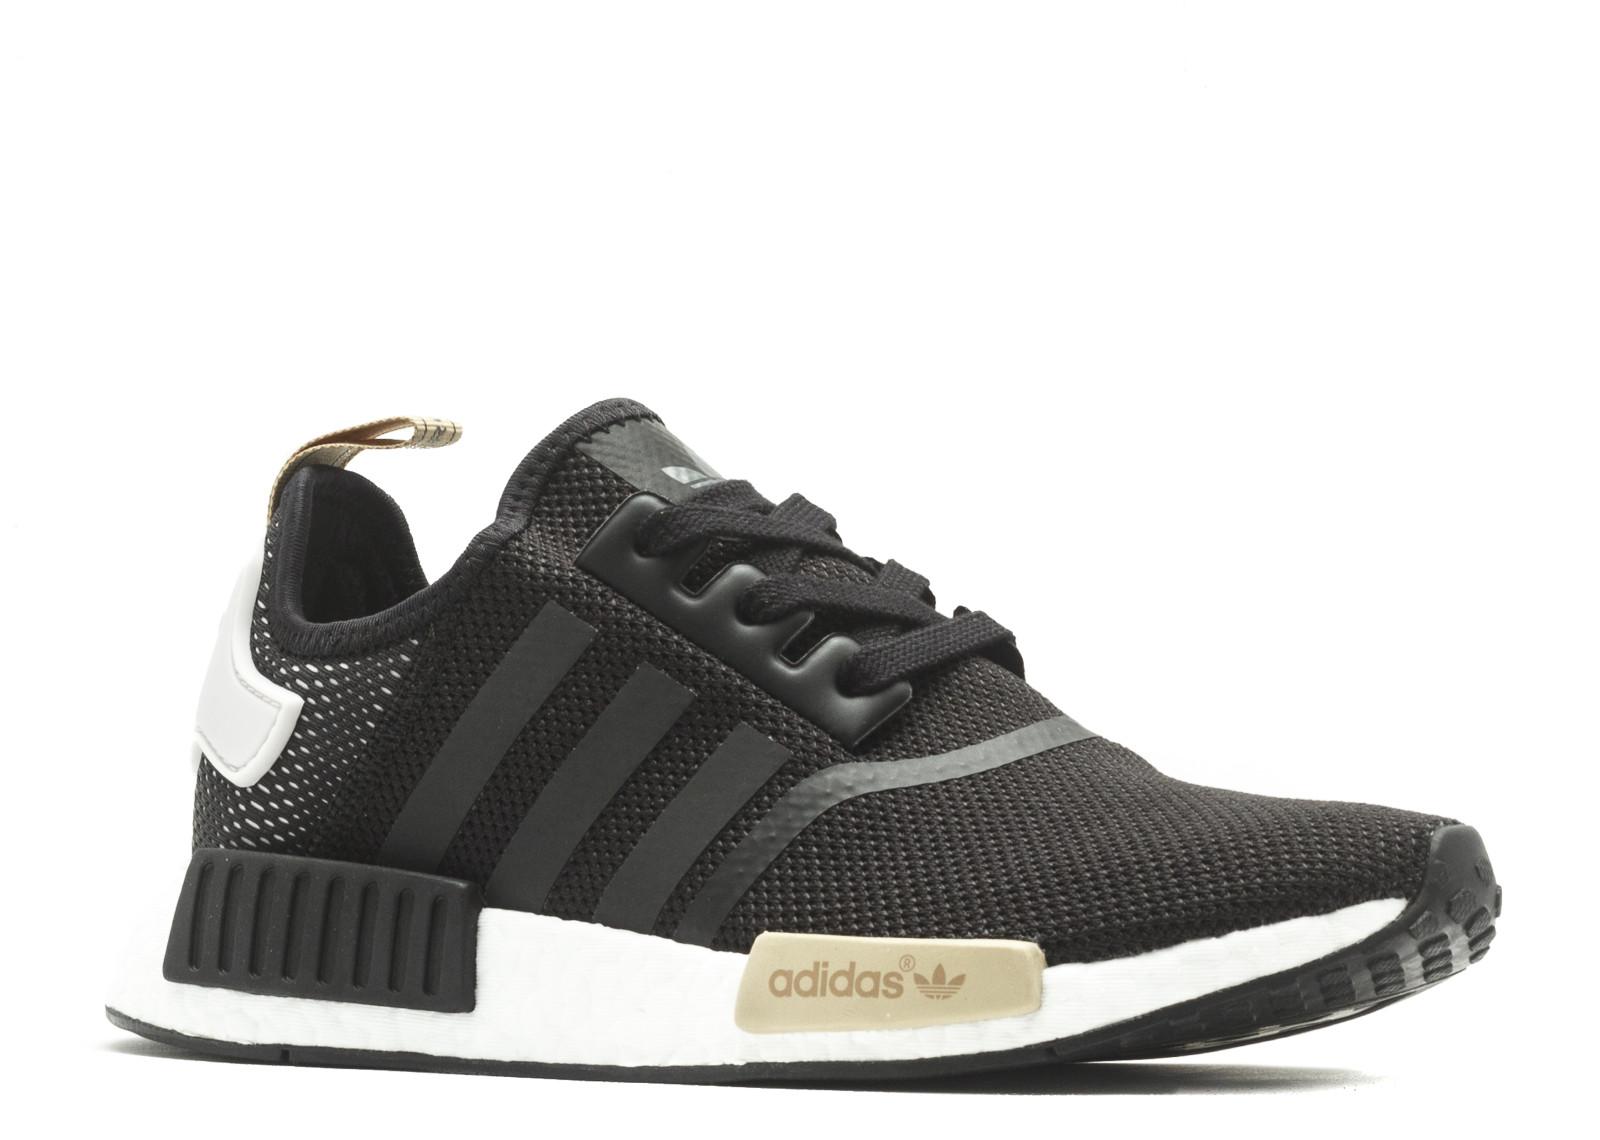 on sale 2b21d b1863 Kick Avenue - Authentic Sneakers